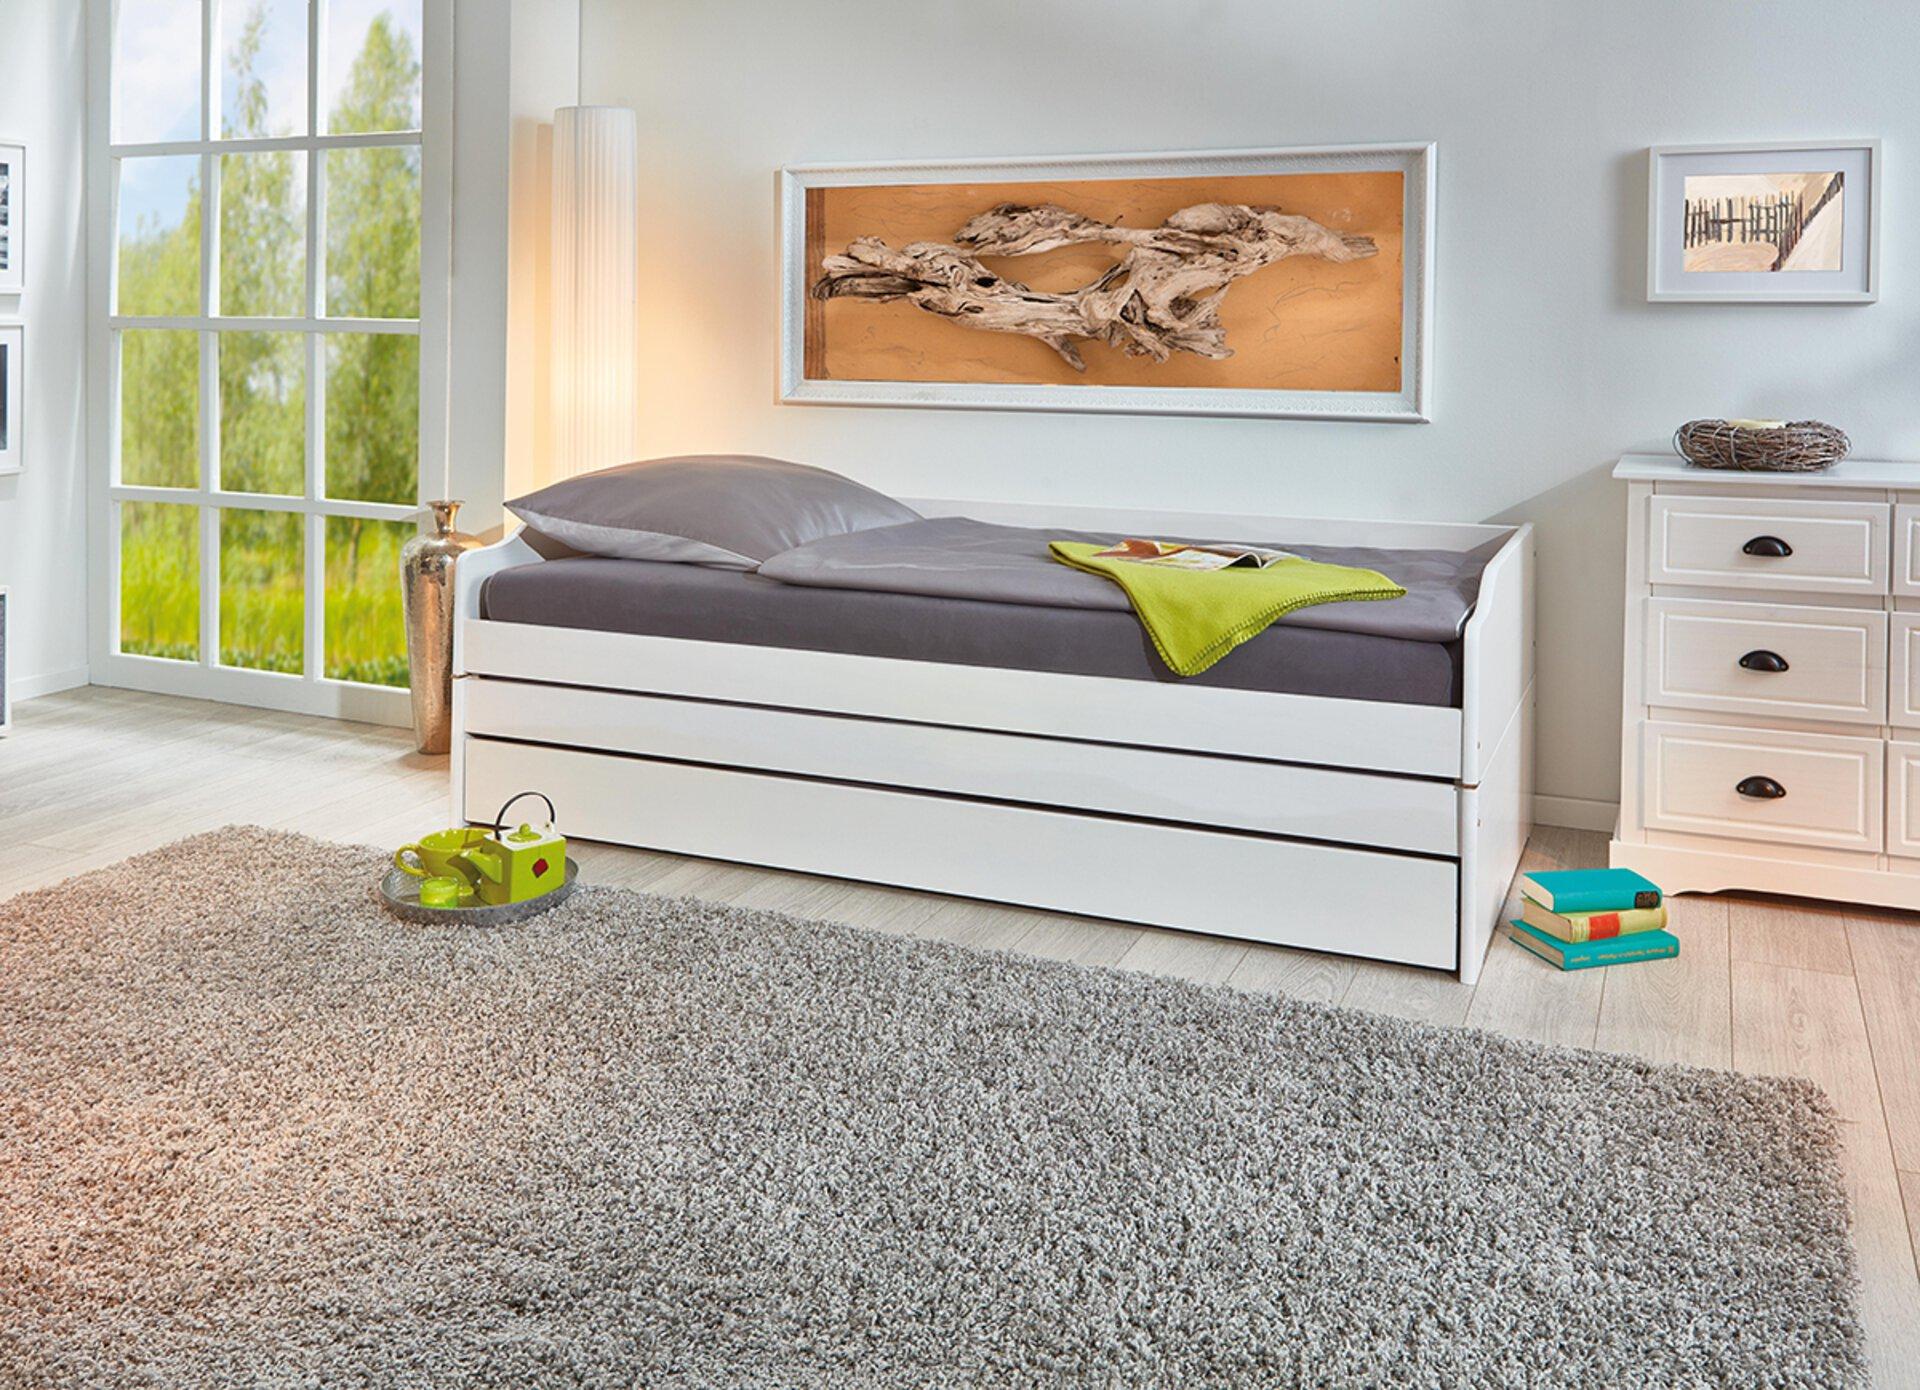 Kinderbett LOTAR Dreamoro Holz weiß 209 x 65 x 97 cm